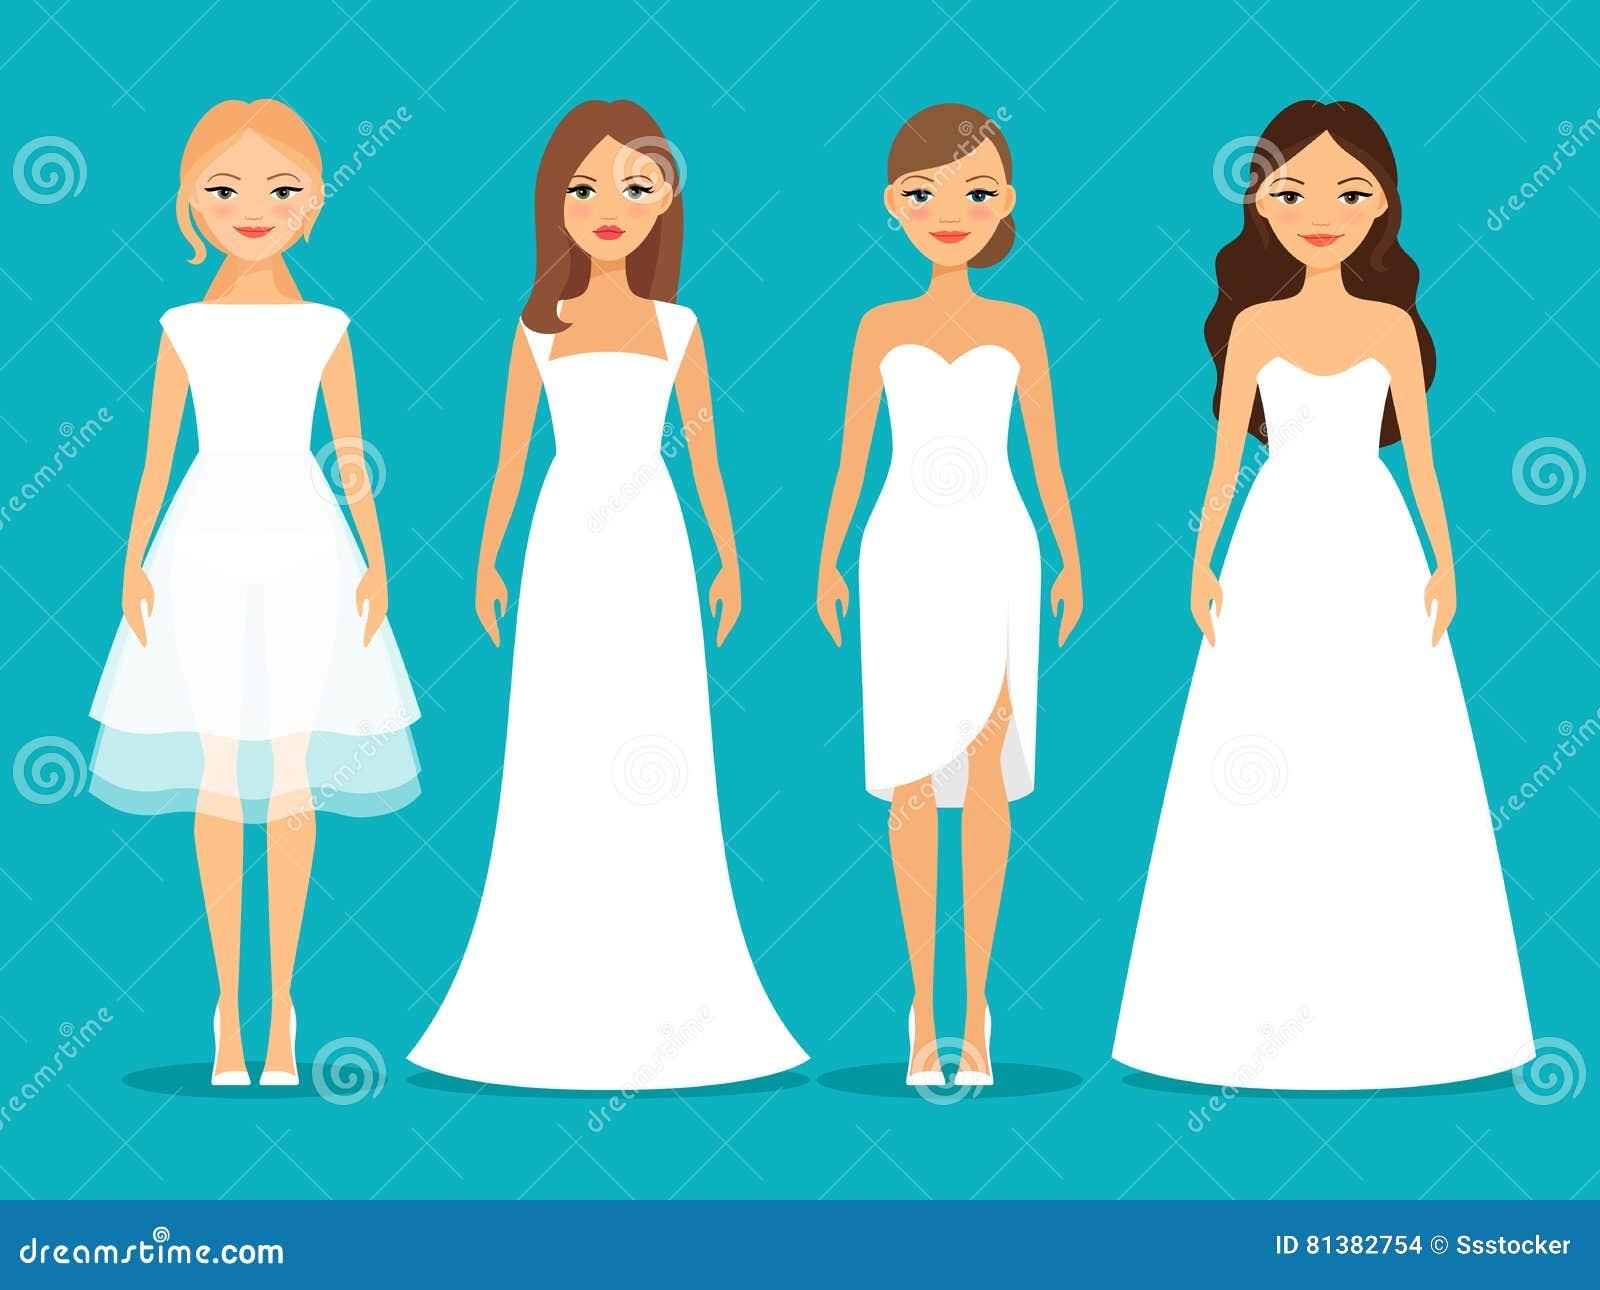 Women in wedding dresses